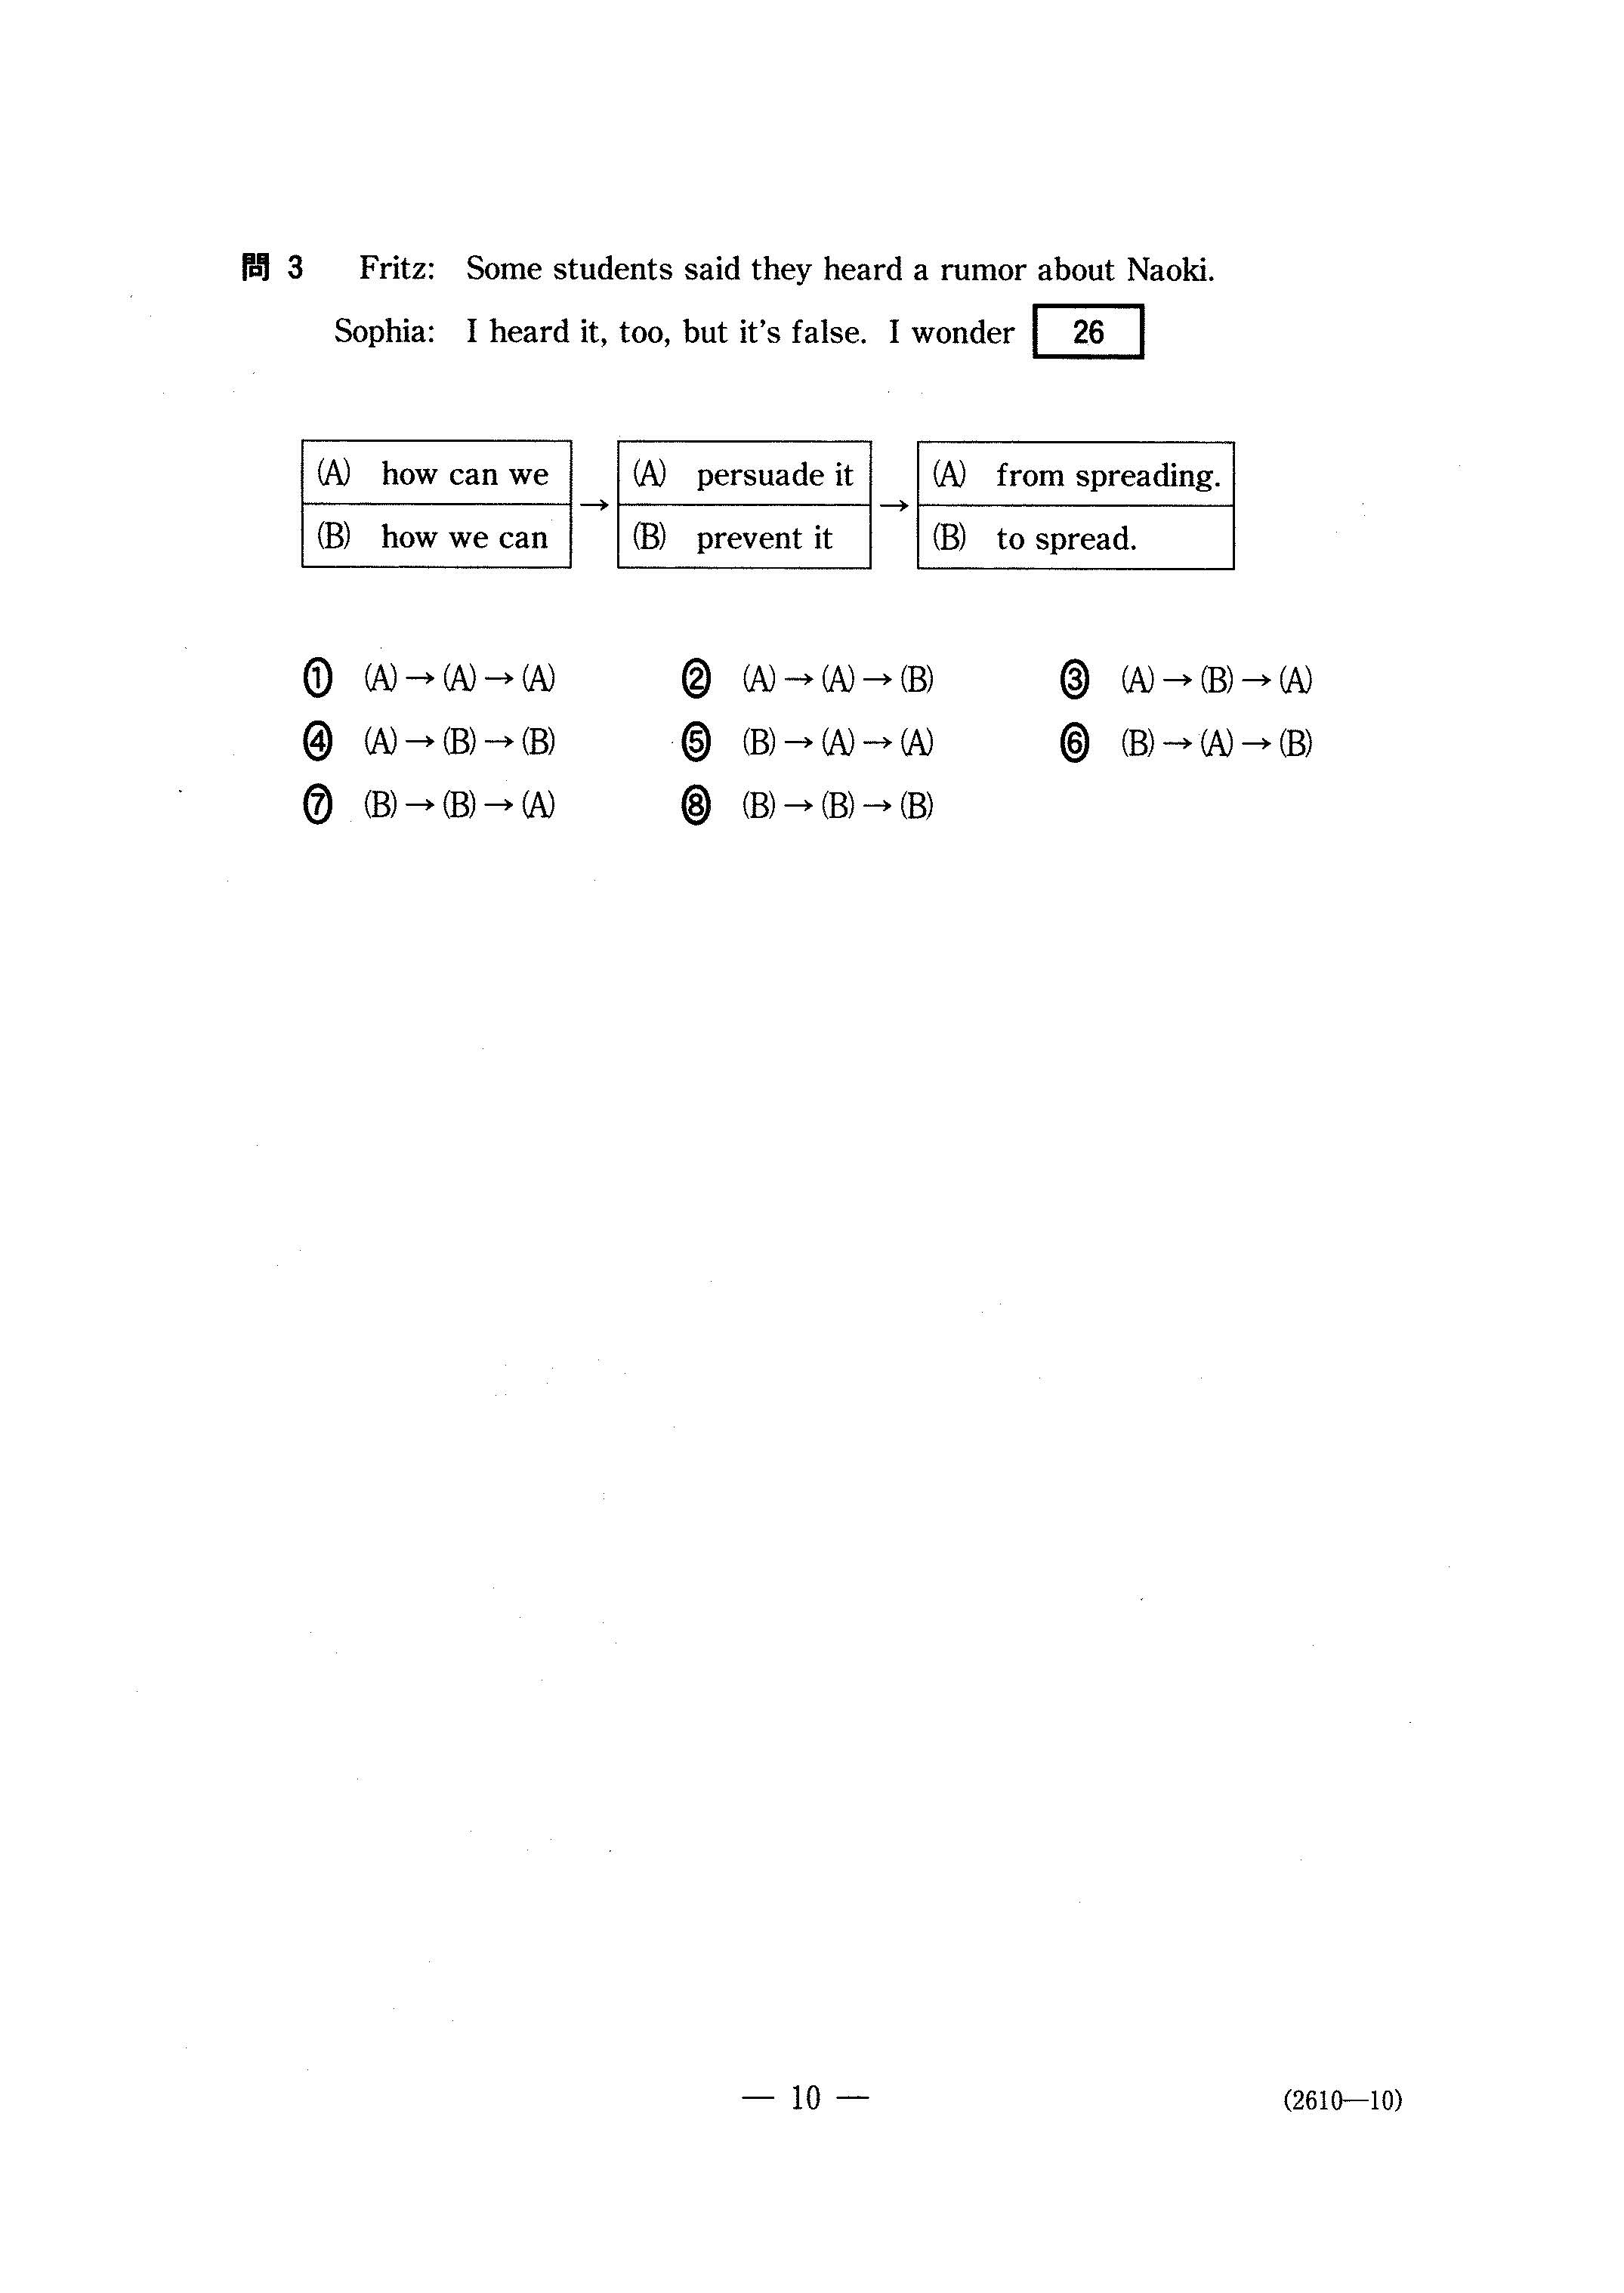 H29外国語 英語(筆記) 大学入試センター試験過去問